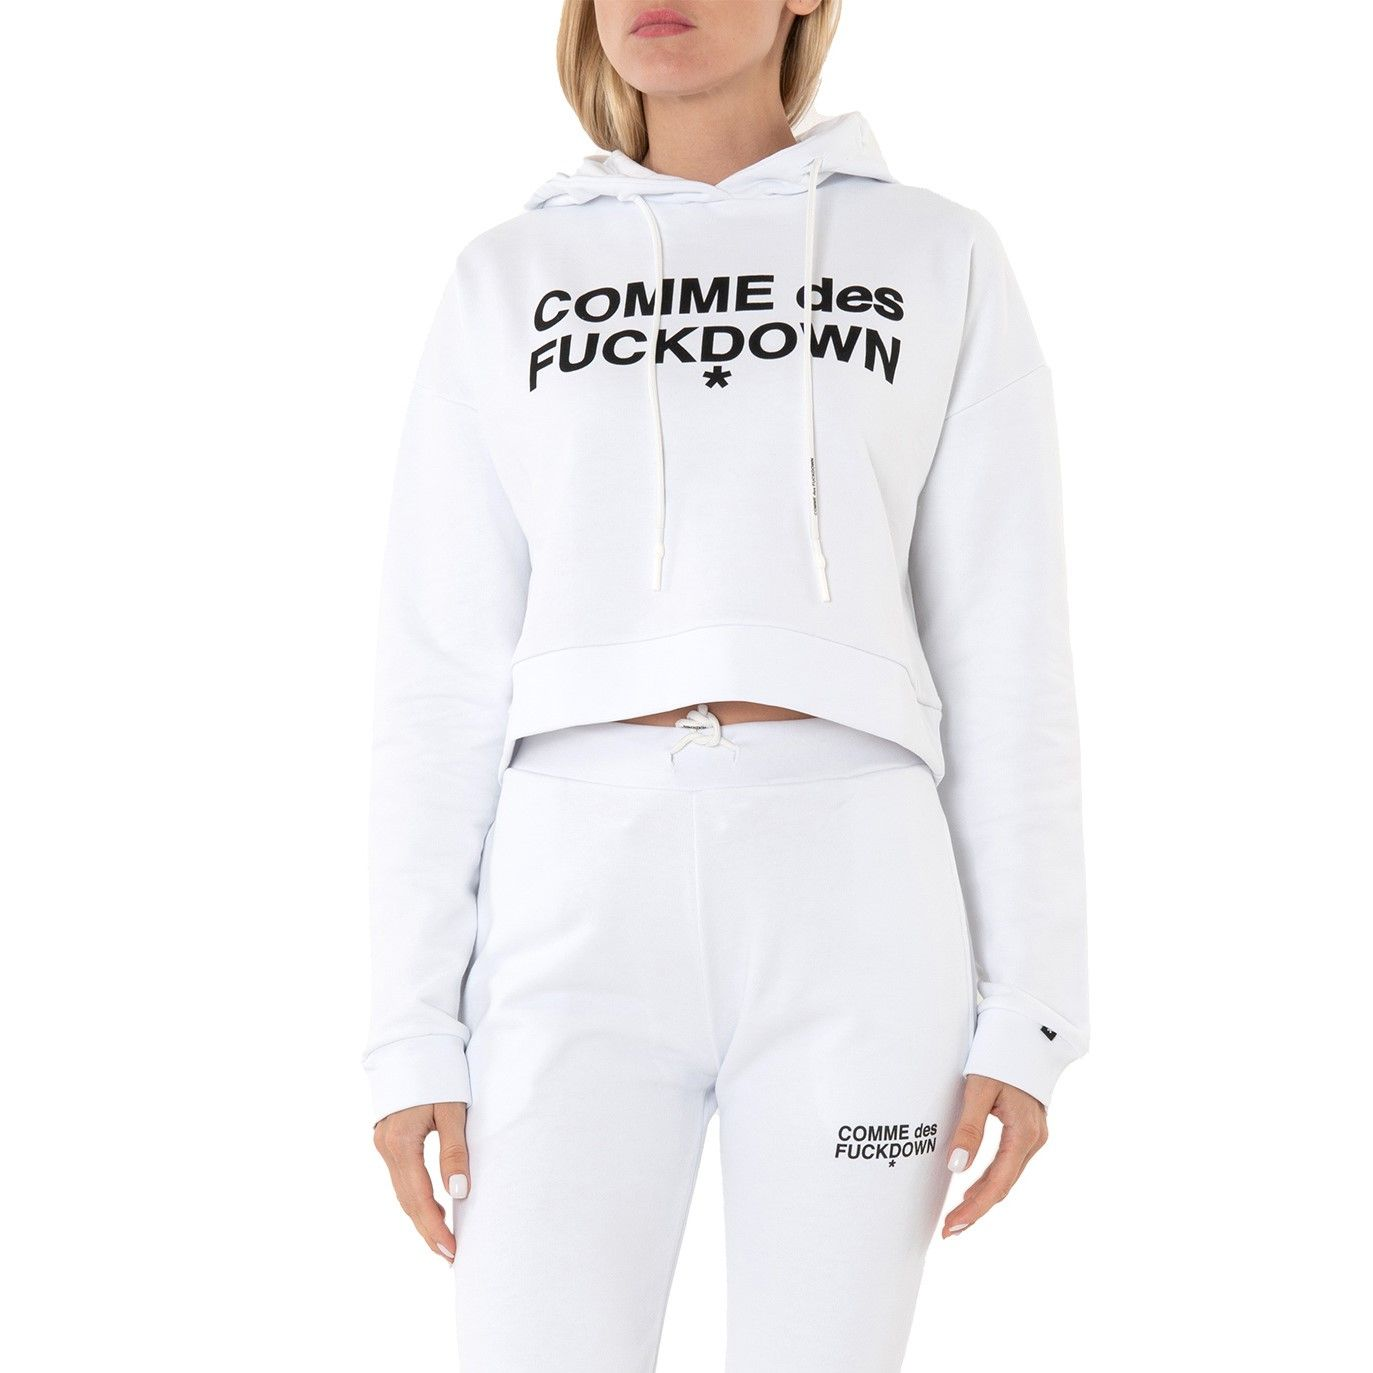 Худи COMME des FUCKDOWN бело-черное